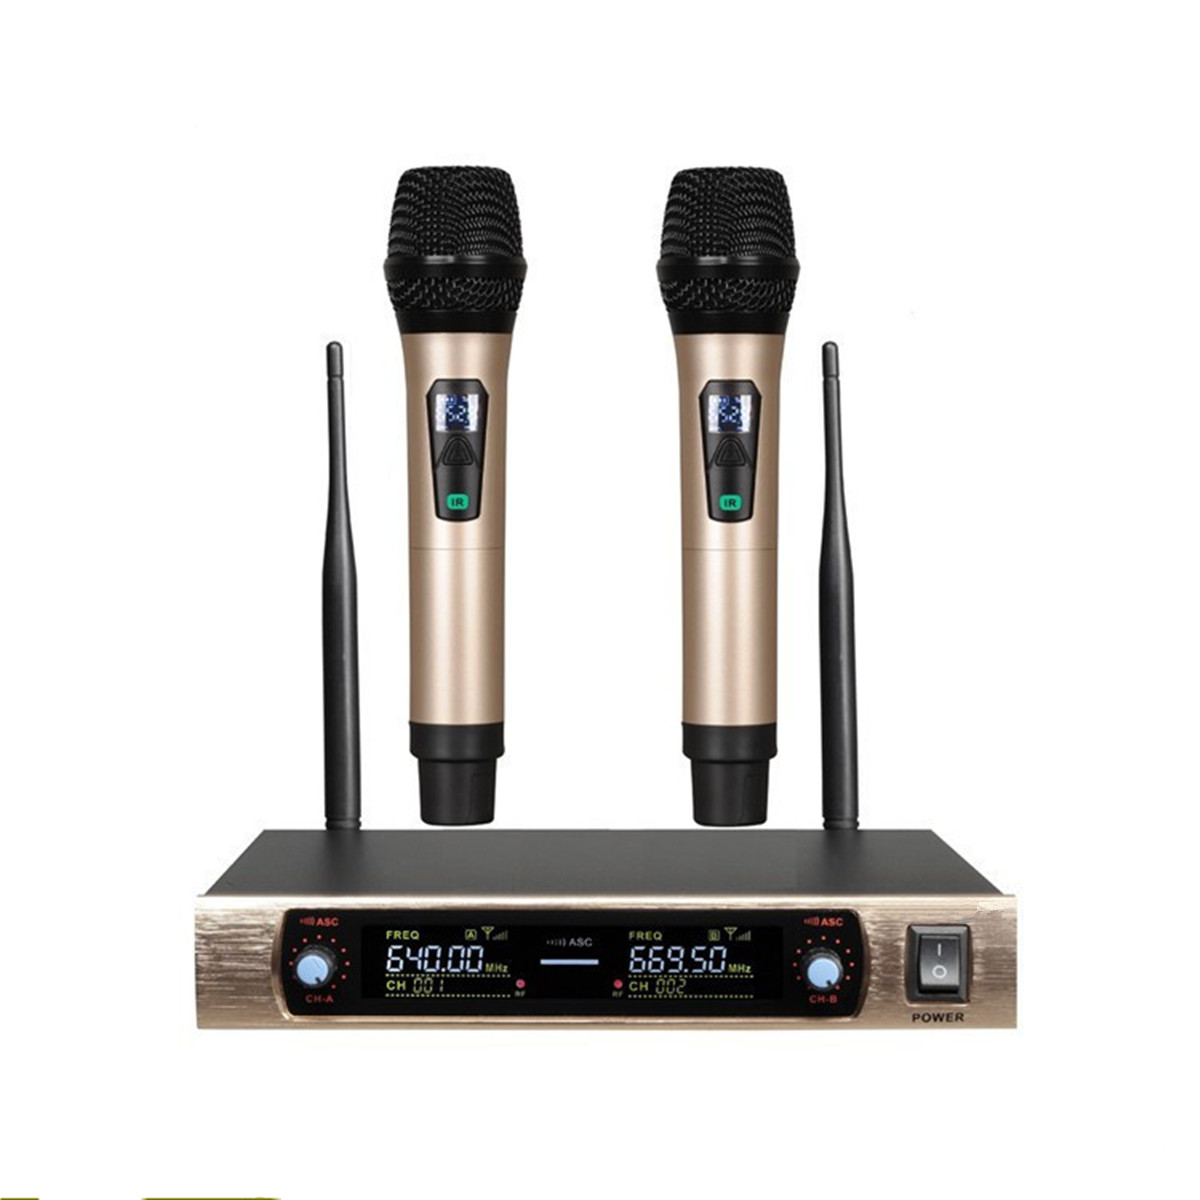 UHF 2 Channel Dual Metal Wireless Microphone Transmitter Set  2pcs/set  Professional Karaoke Wireless Handheld Microphone